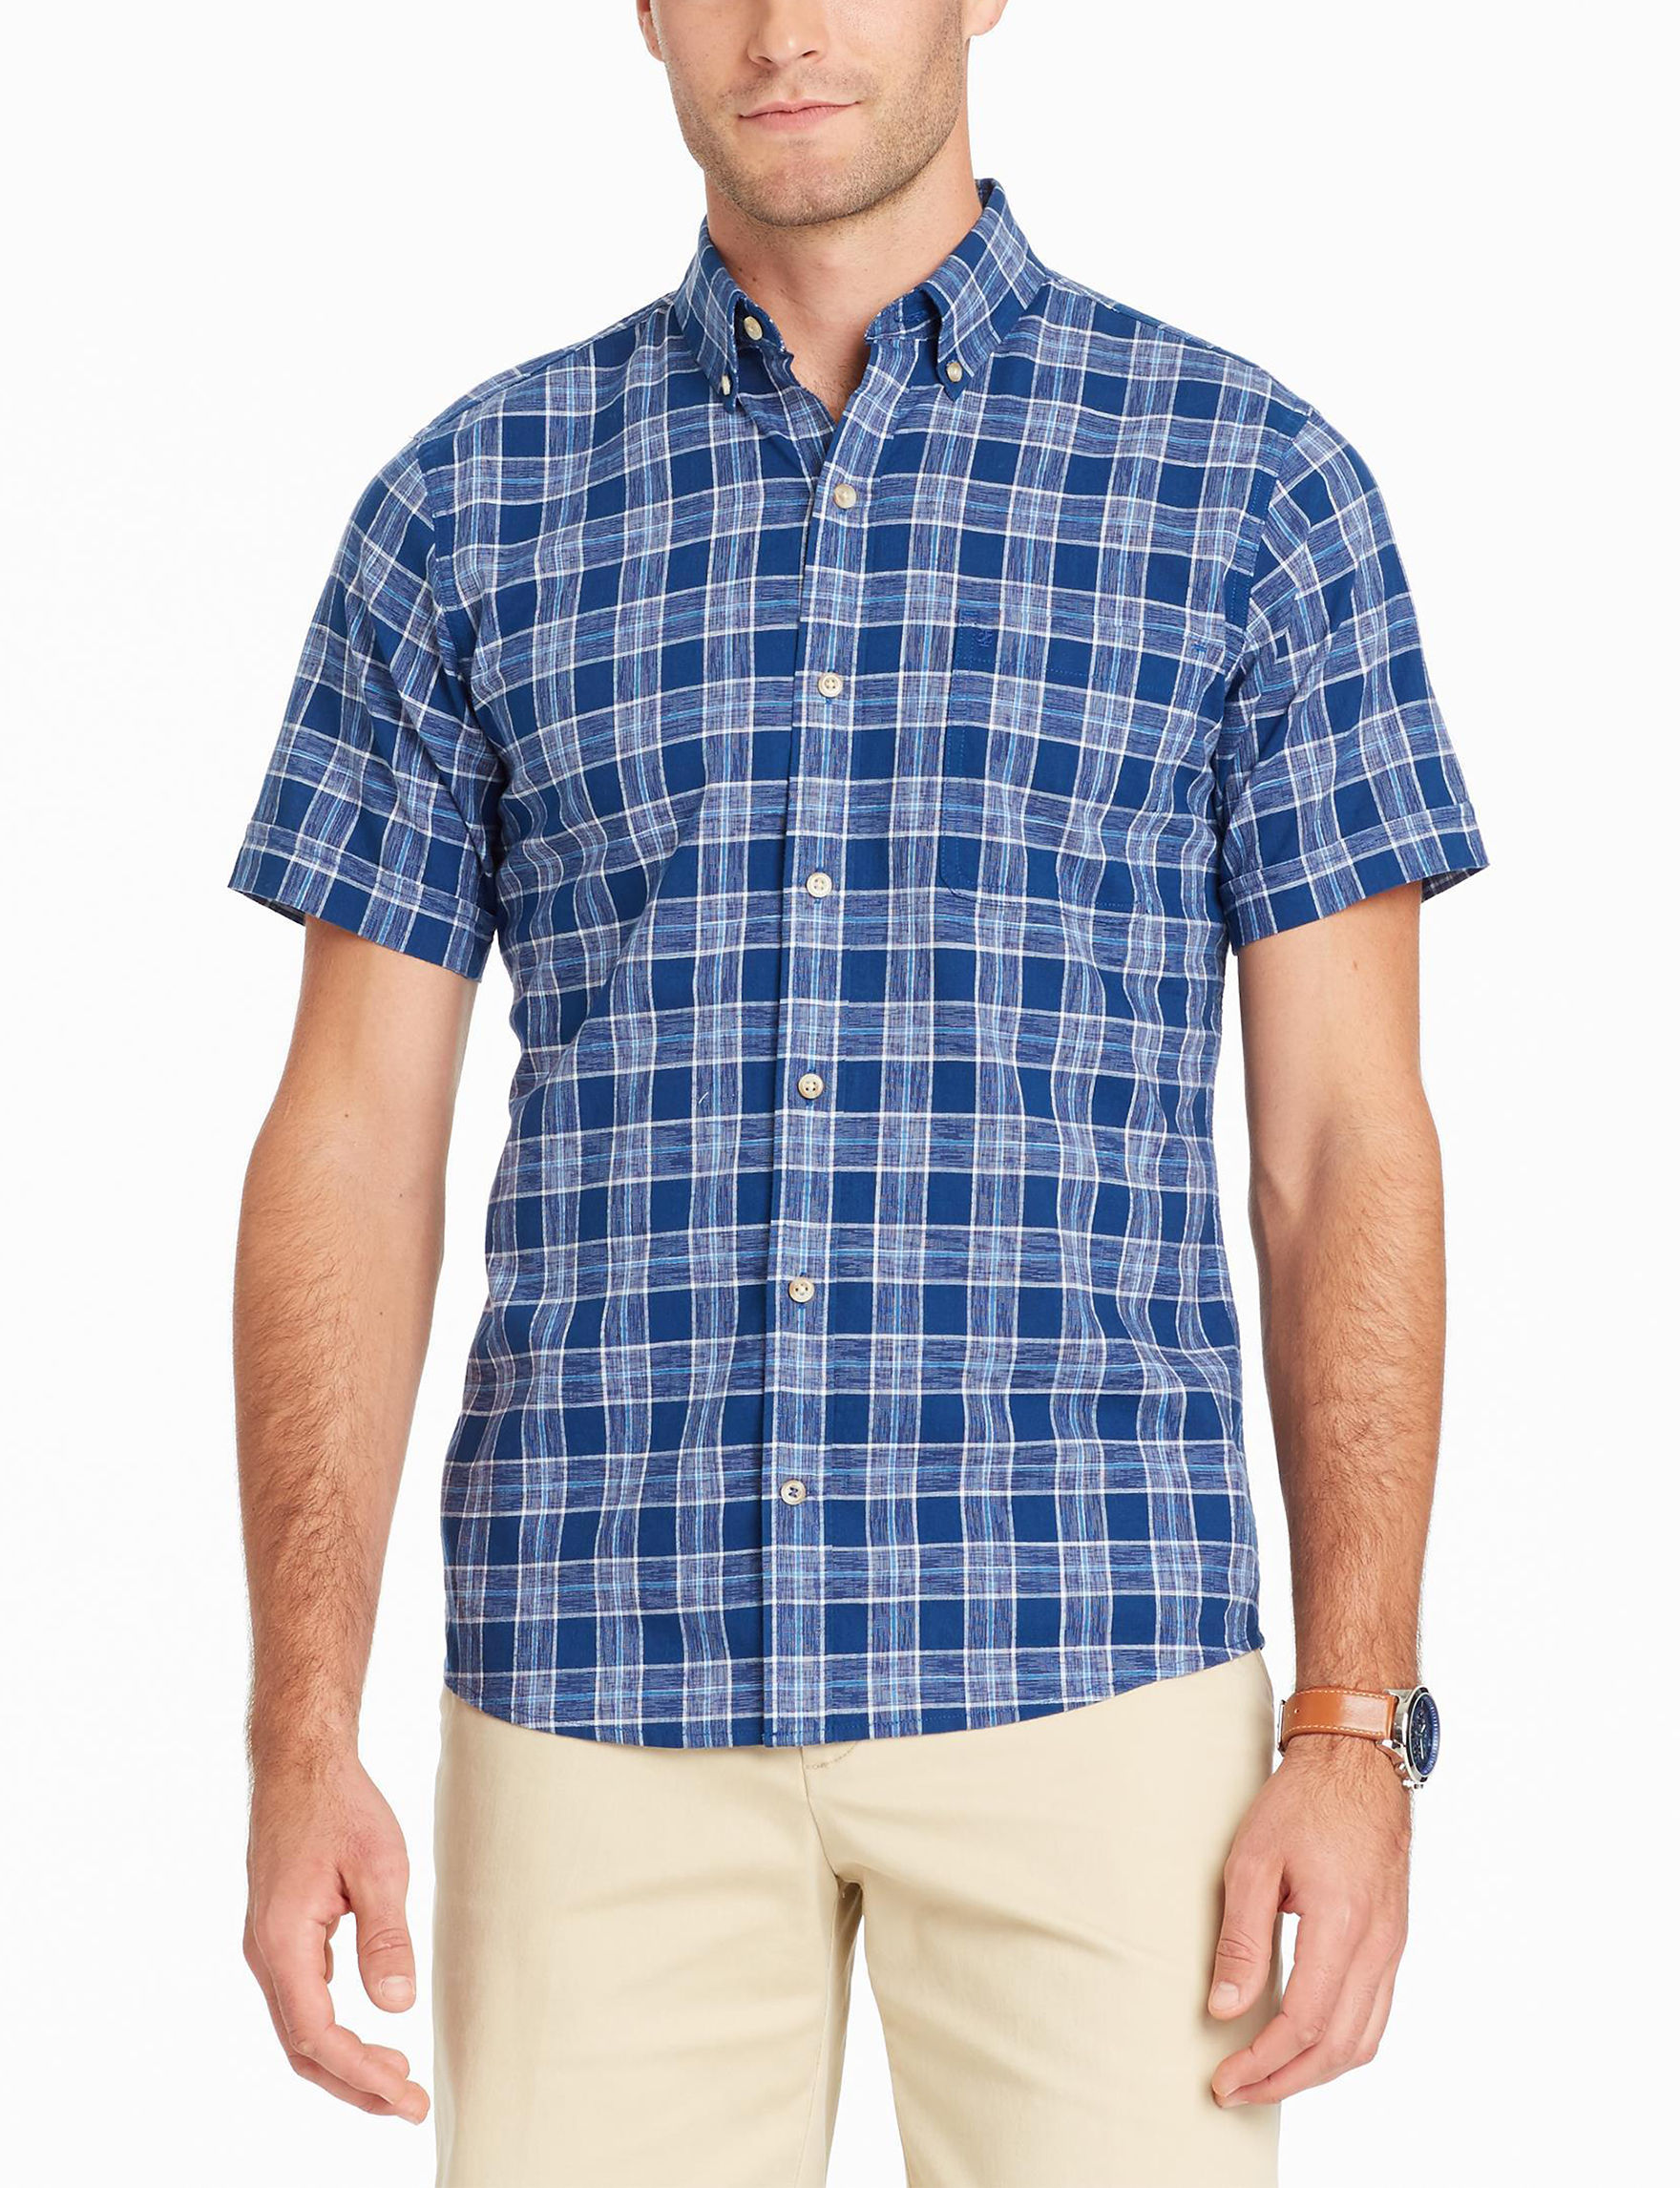 Izod Blue Plaid Casual Button Down Shirts